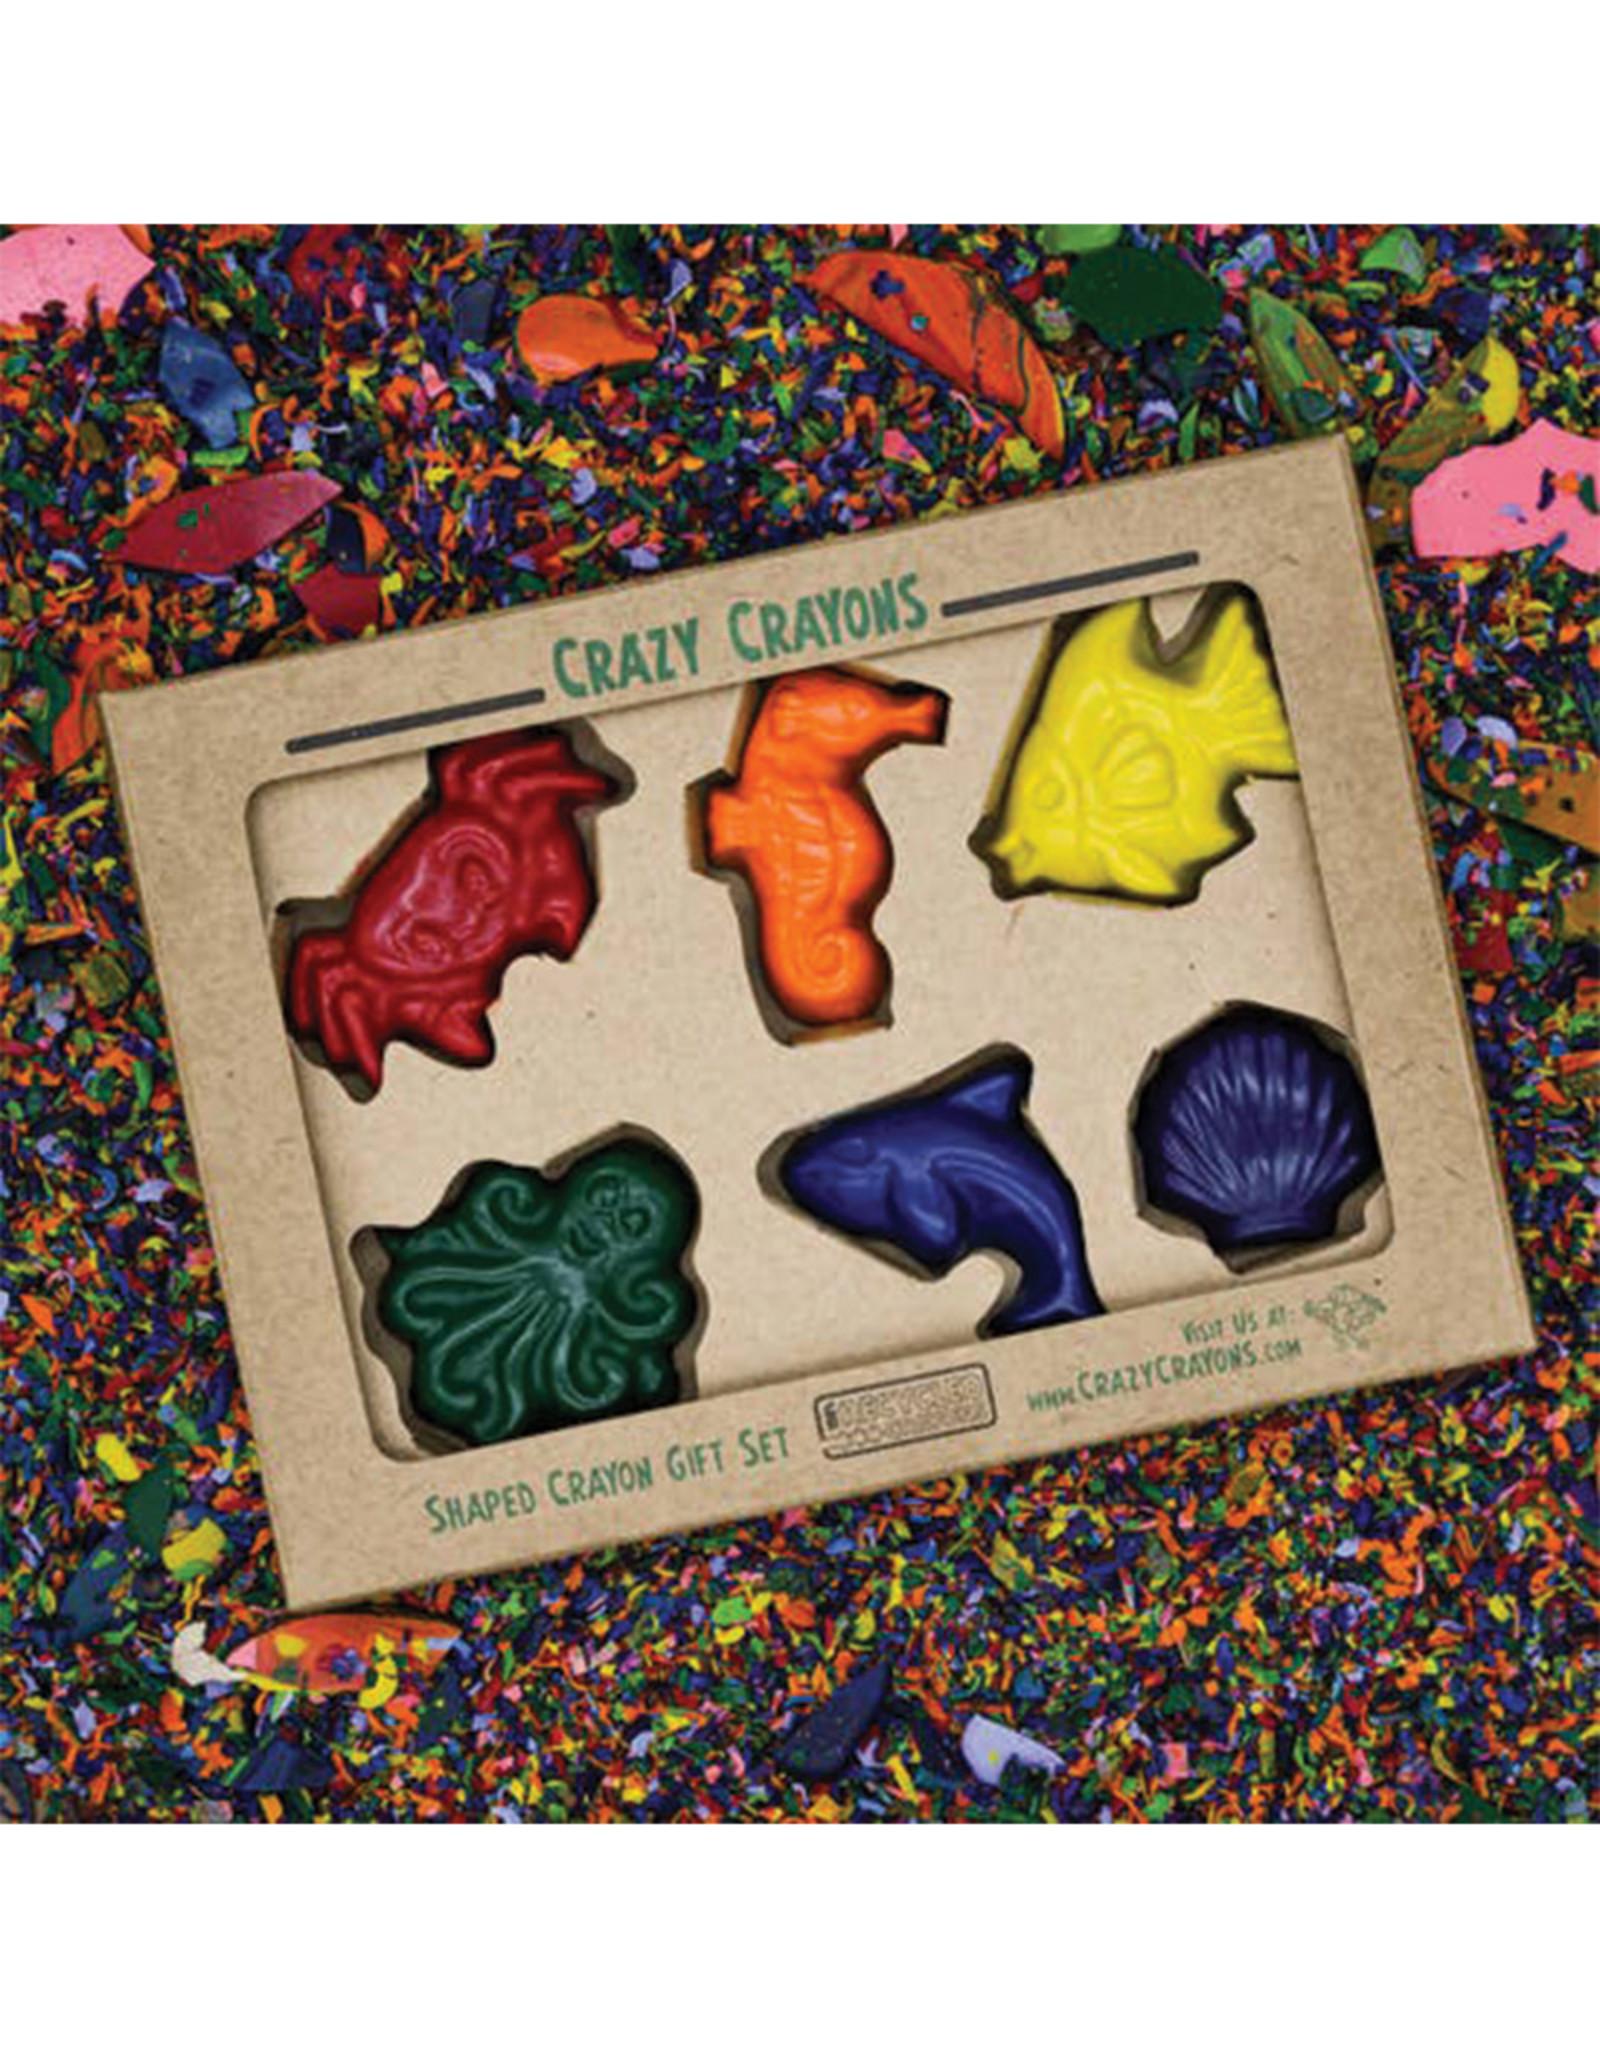 Crazy Crayons Ocean Recycled Crayons